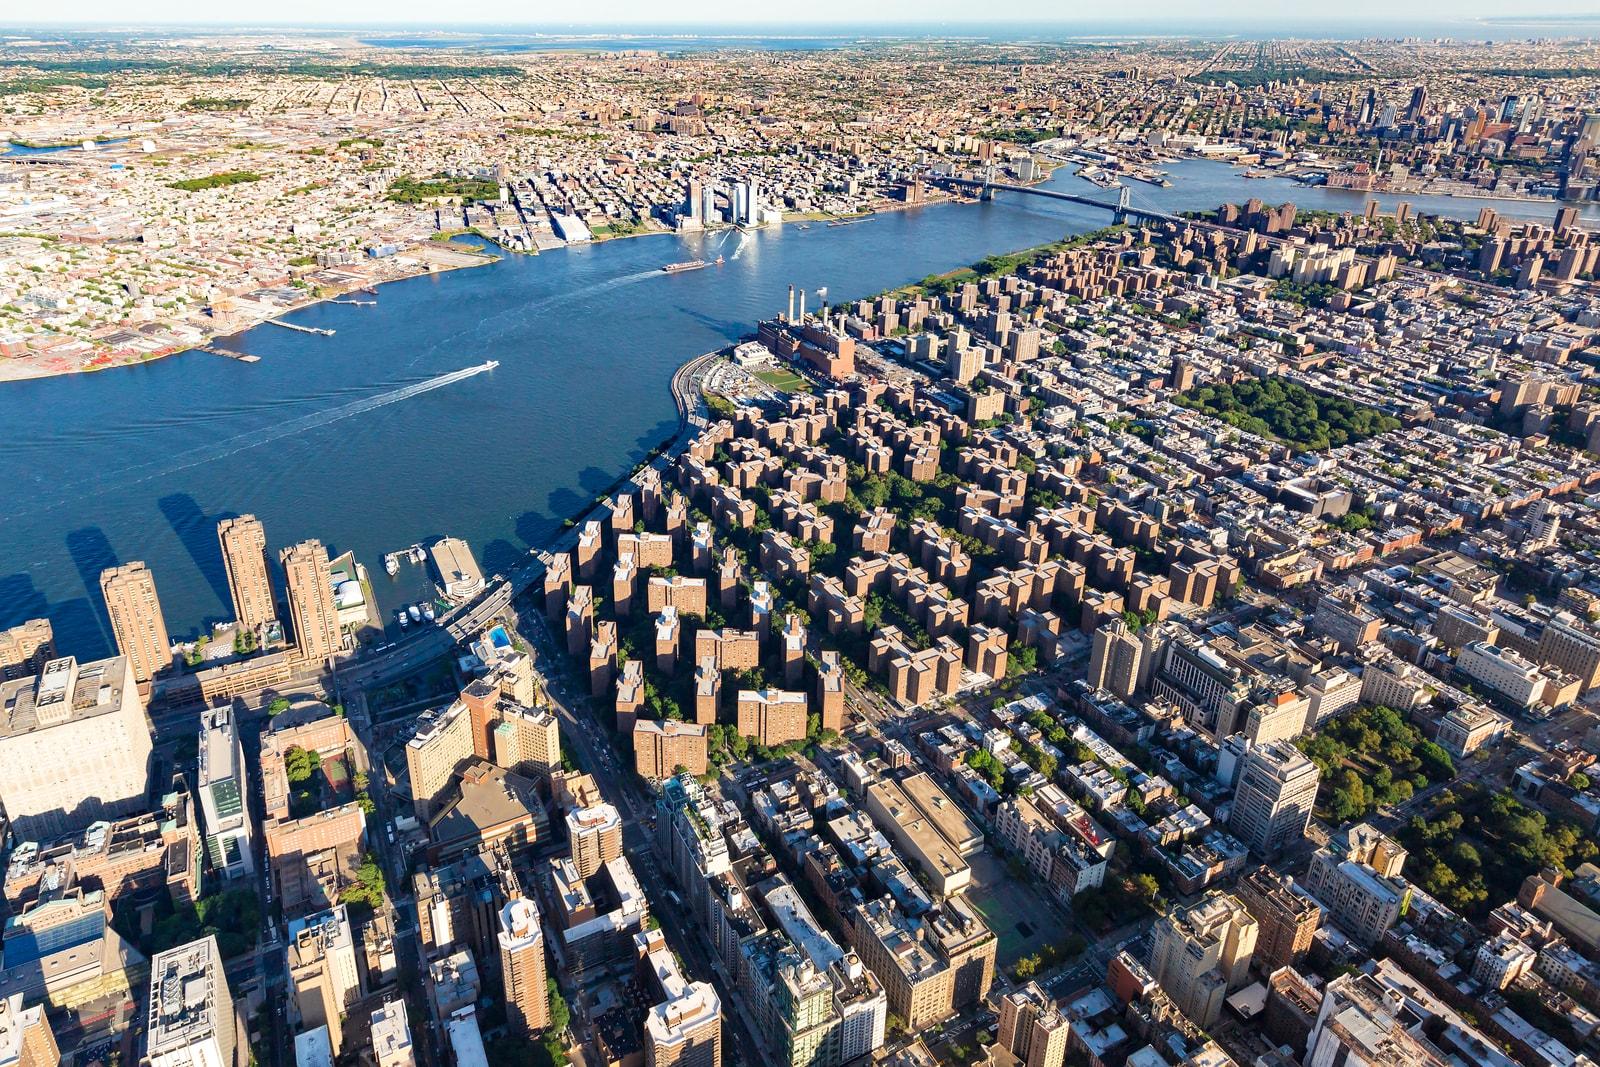 vivendo-bairro-baixo-leste-lado-nova-york